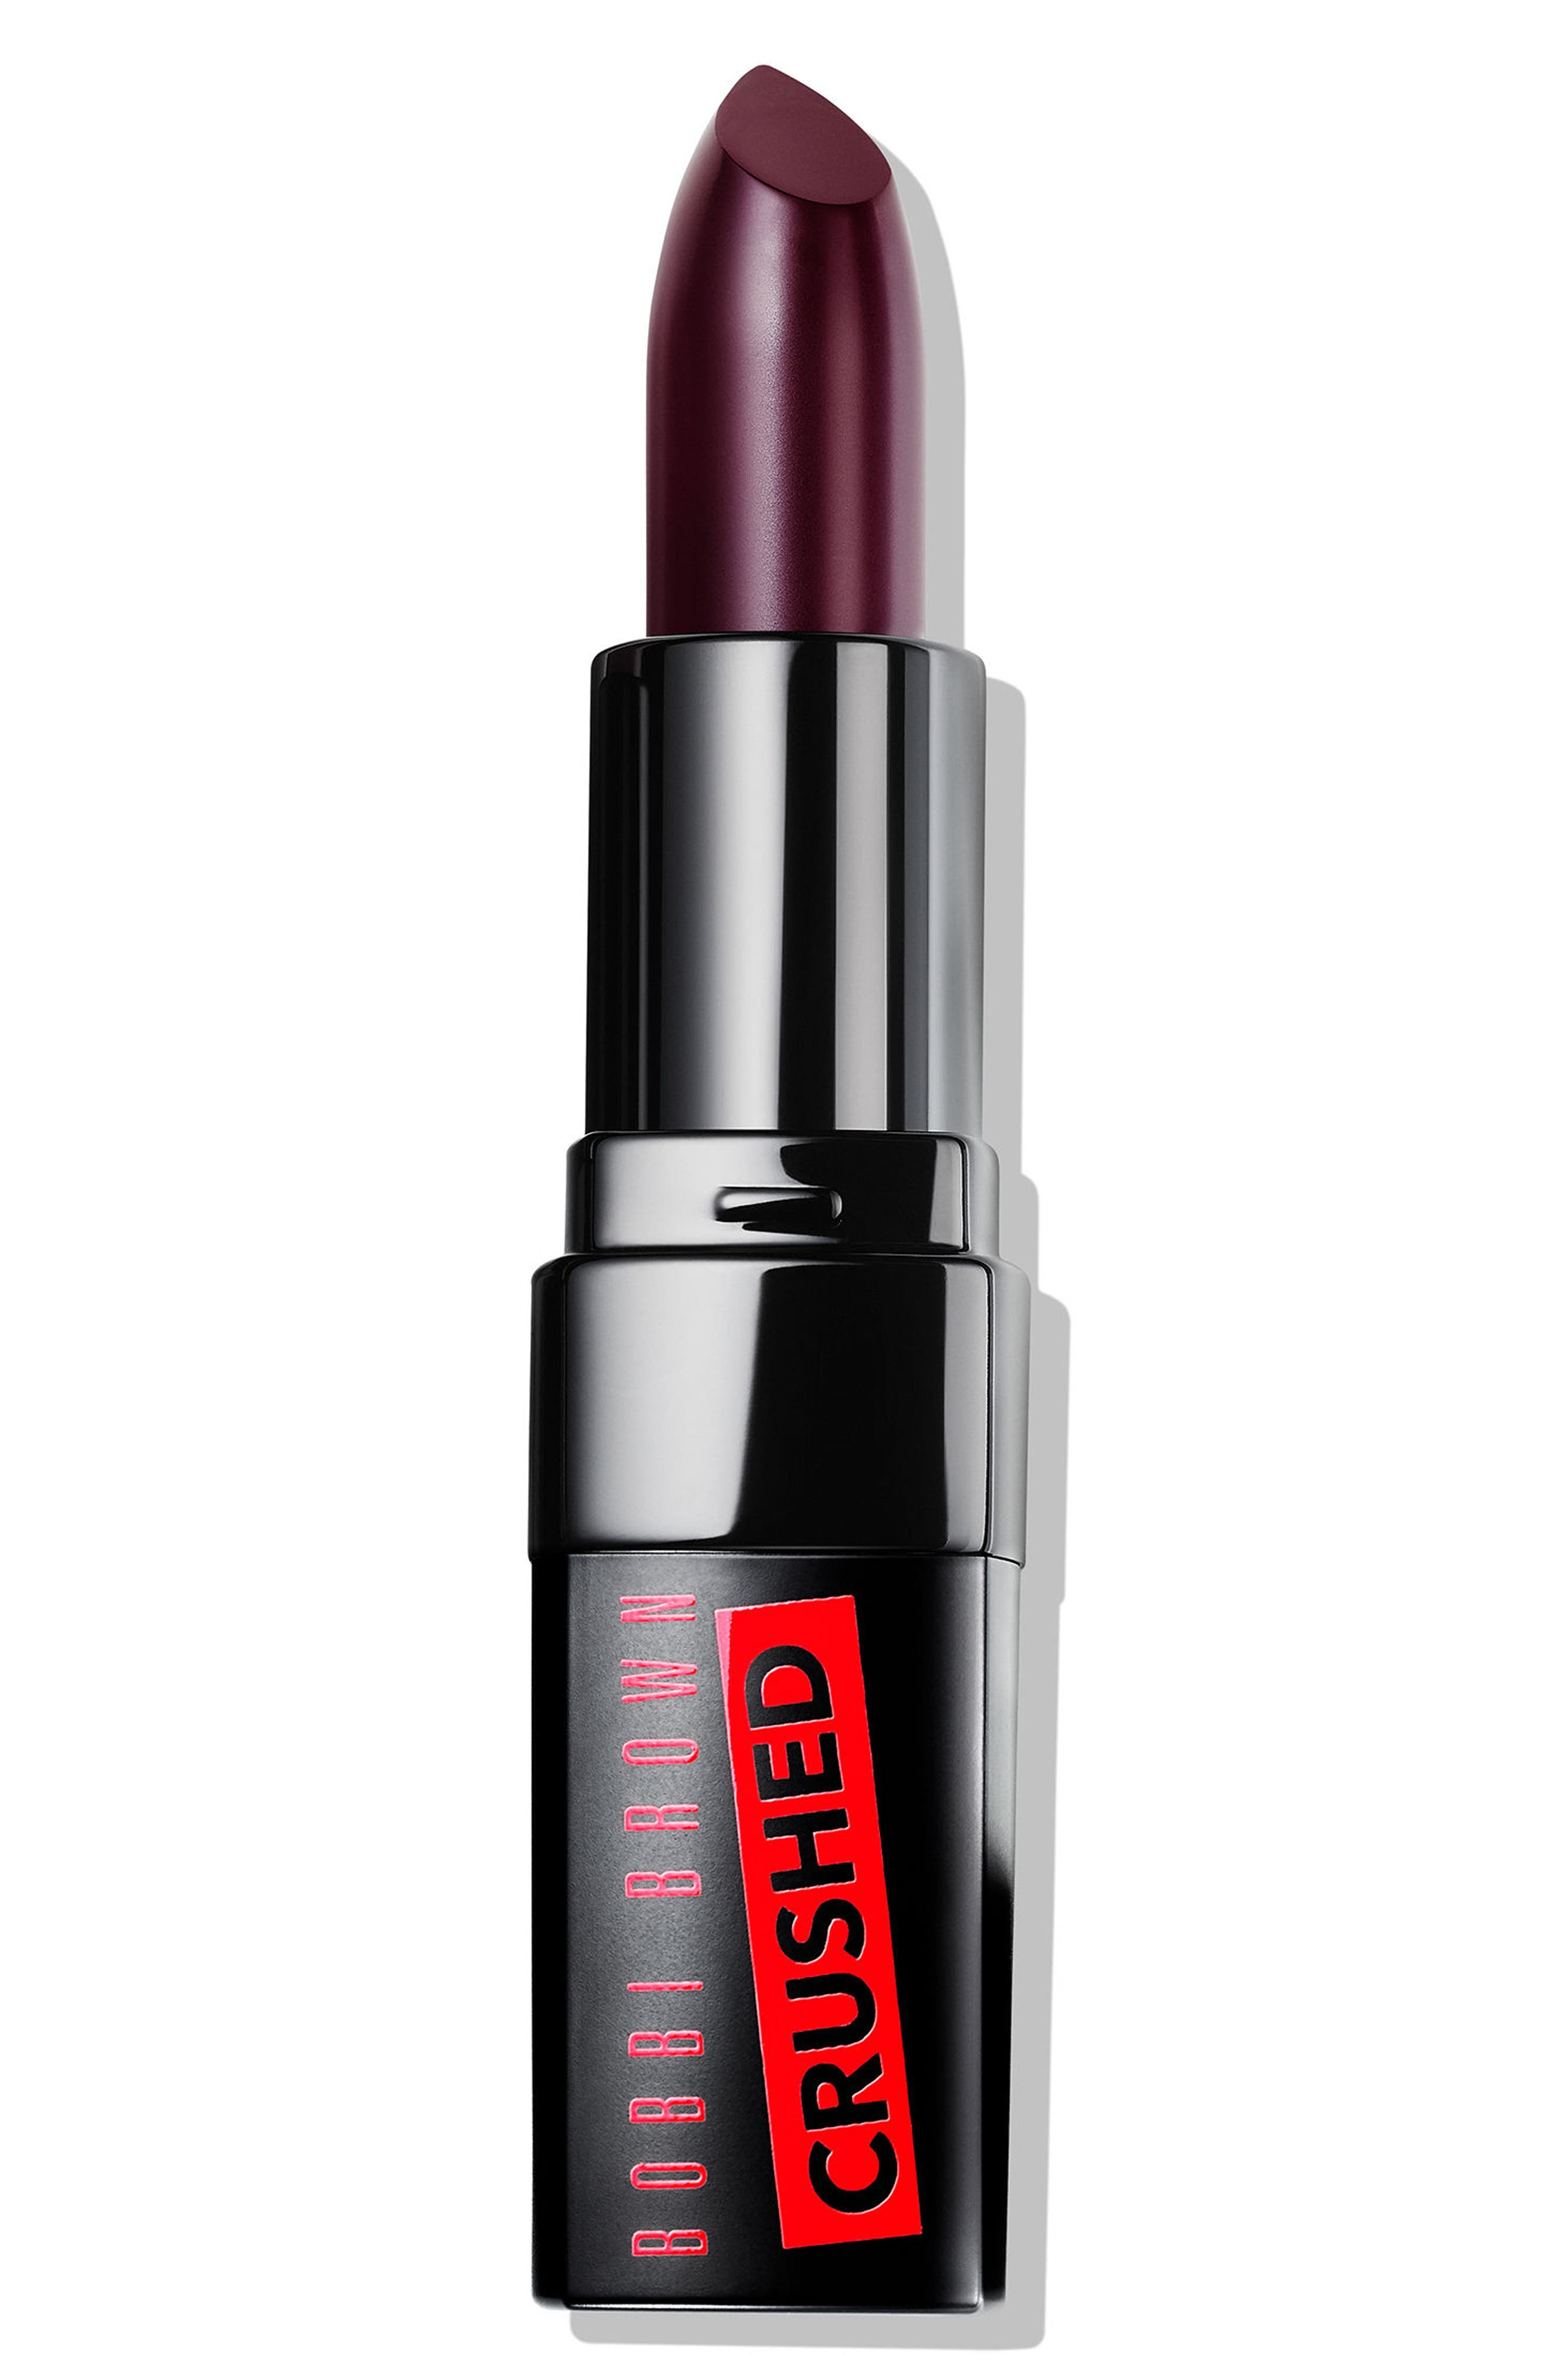 Alternate Image 1 Selected - Bobbi Brown Crushed Lip Color (Limited Edition)